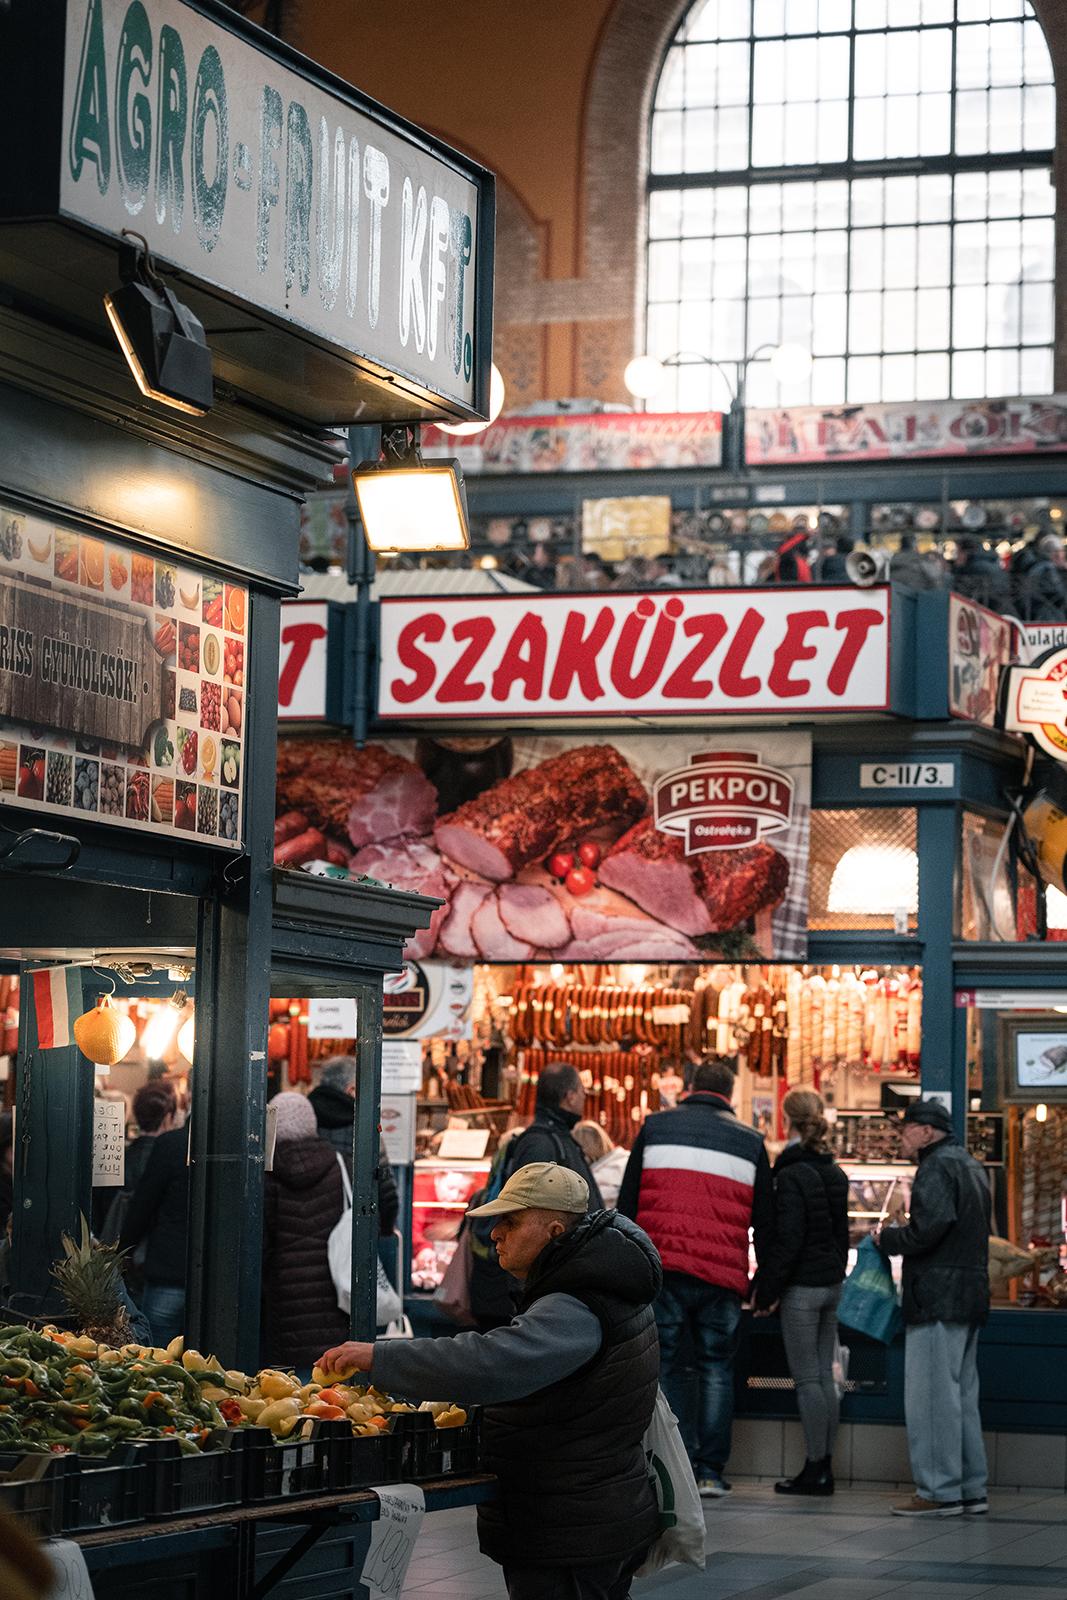 Food stalls inside Budapest Central Market Hall